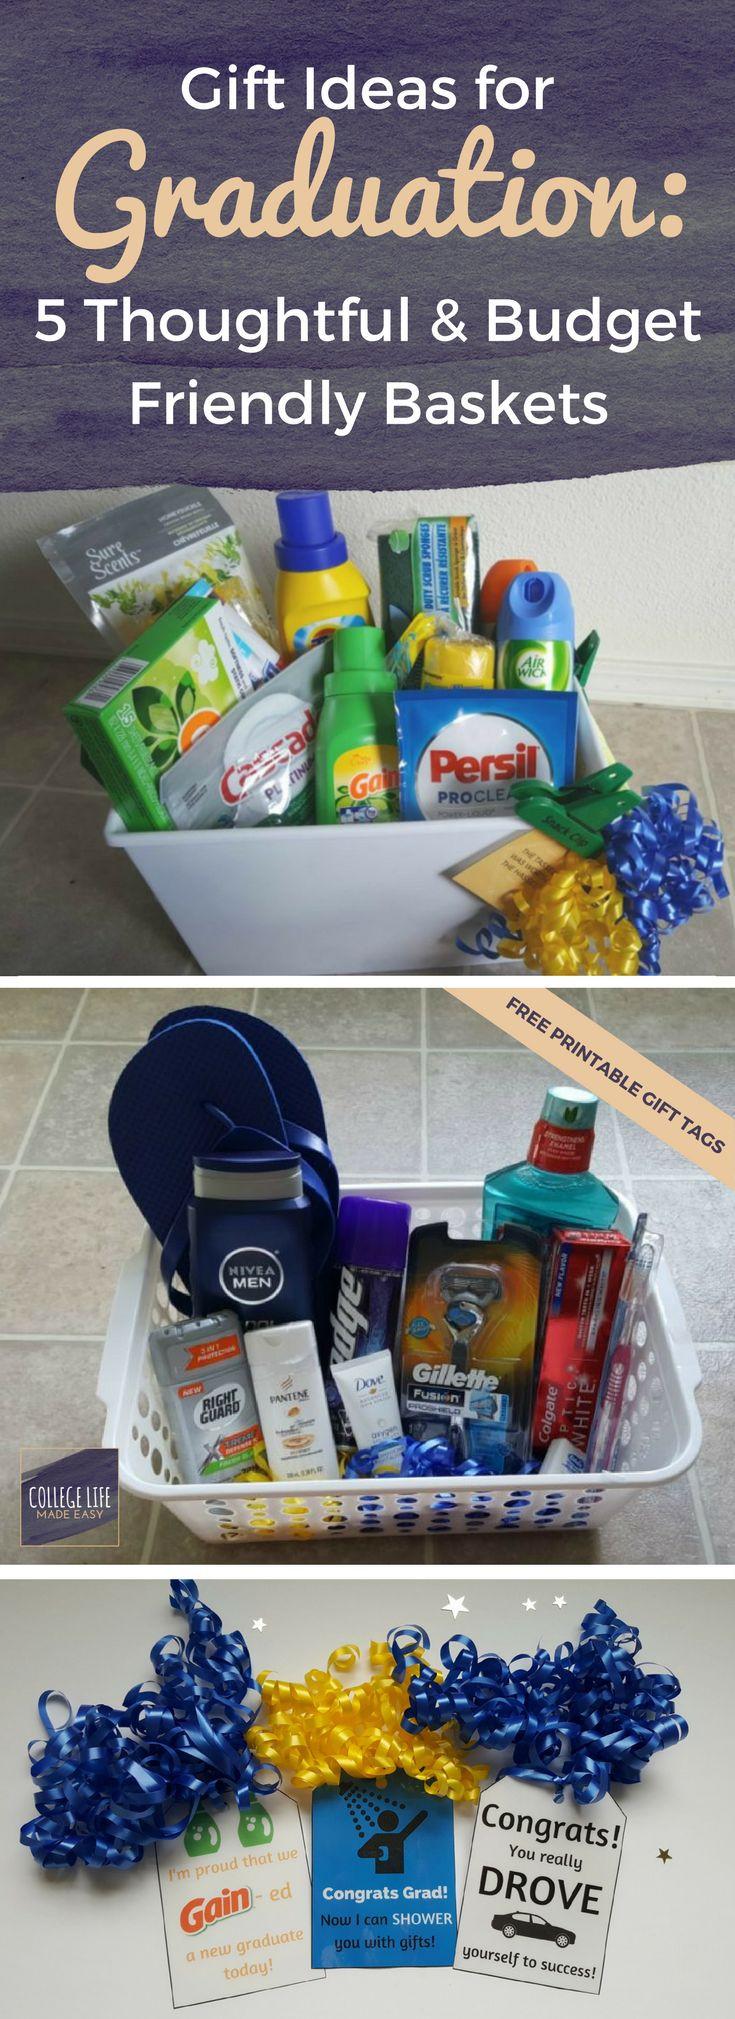 High School Graduation Gift Ideas For Guys  Gift Ideas for Graduation 5 Thoughtful & Bud Friendly